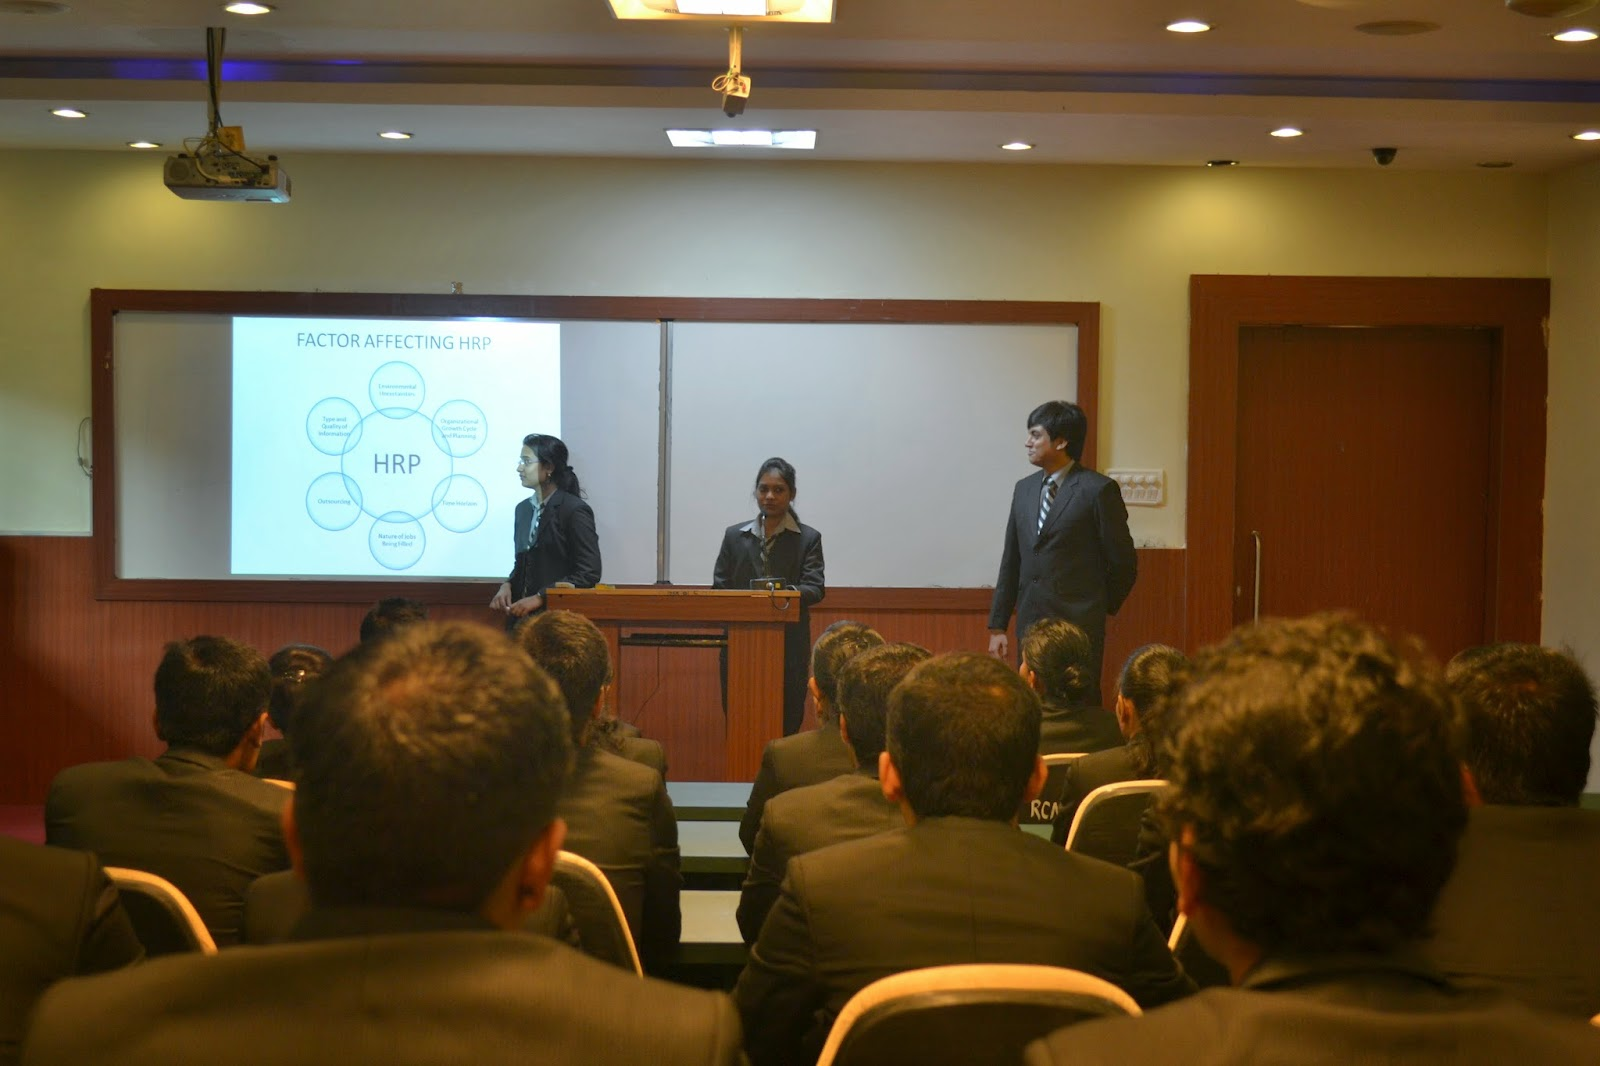 RCM MBA Students